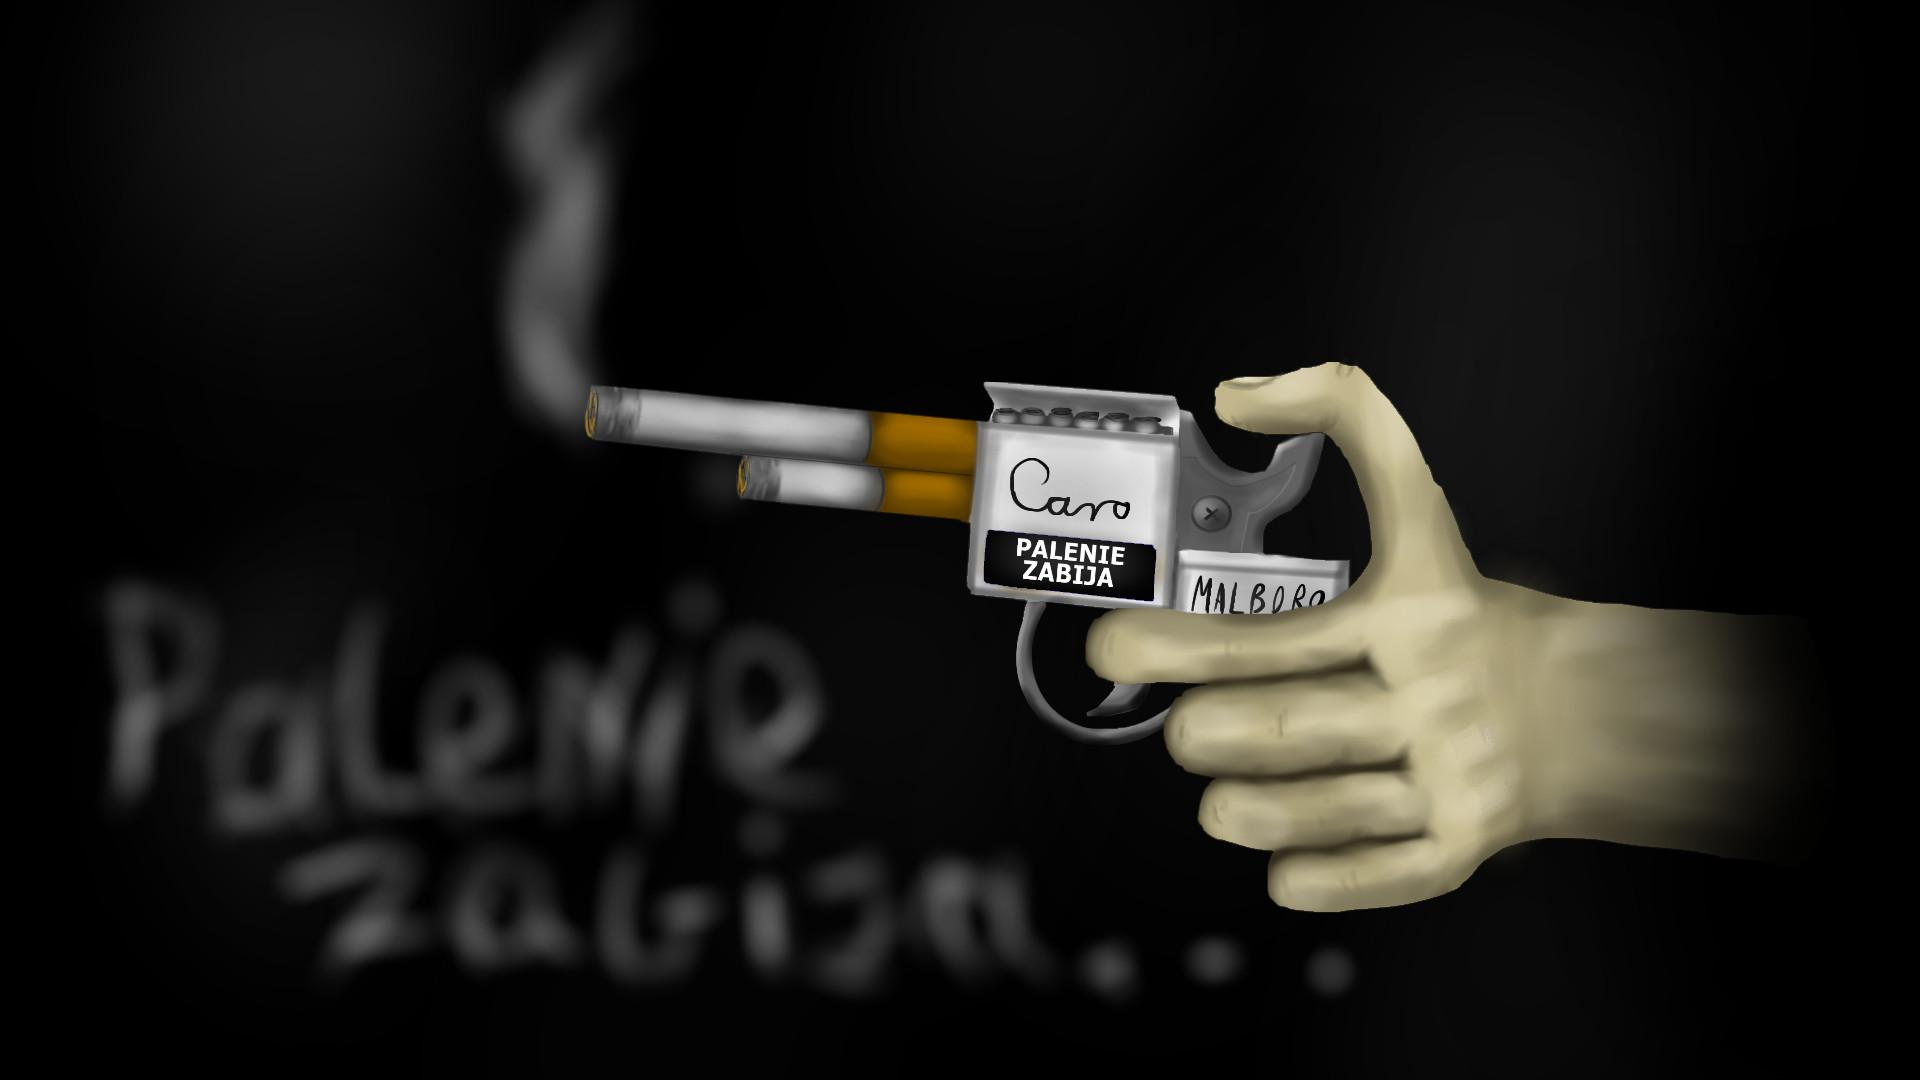 Funny Guns Smoking Wallpaper HD 2190 #2667 Wallpaper | High Resolution .